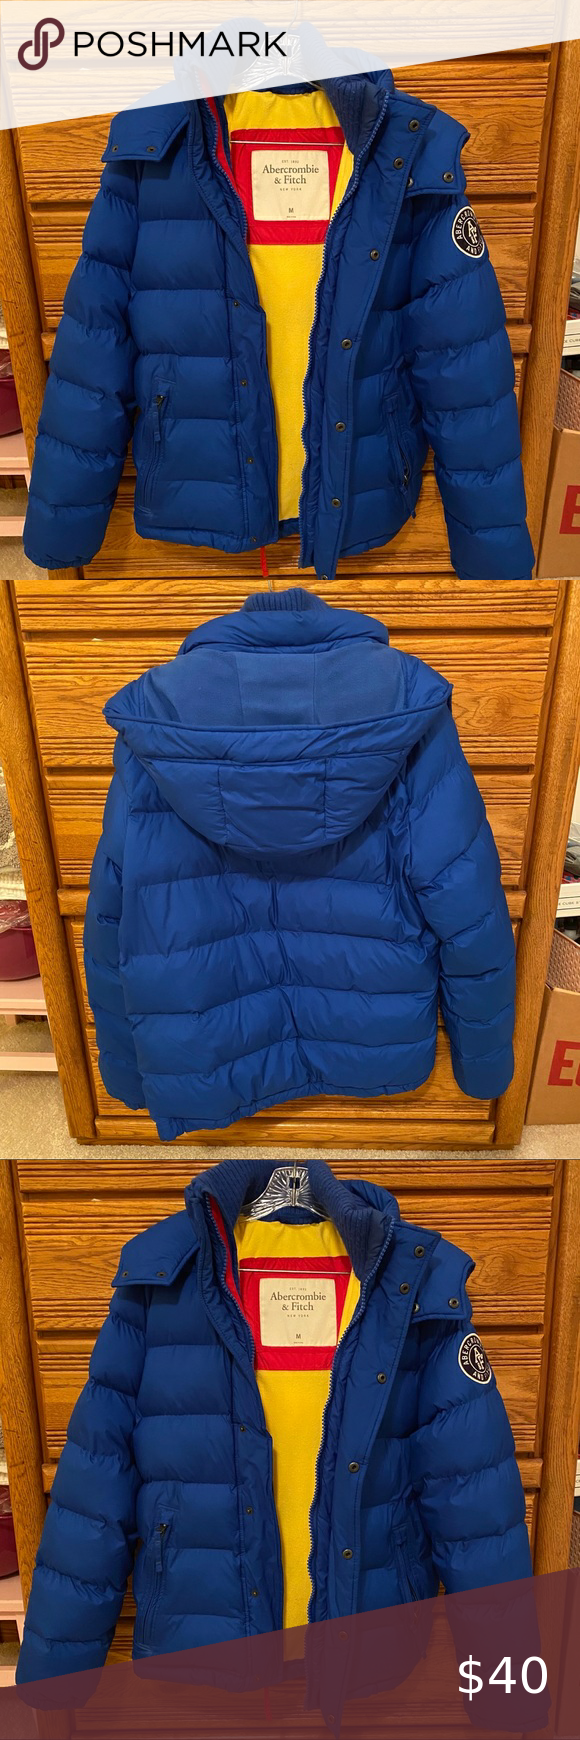 Abercrombie Fitch Men S Hunters Blue Puff Jacket Doll Clothes American Girl Light Blue Shirts Women Blue Puffer Jacket [ 1740 x 580 Pixel ]